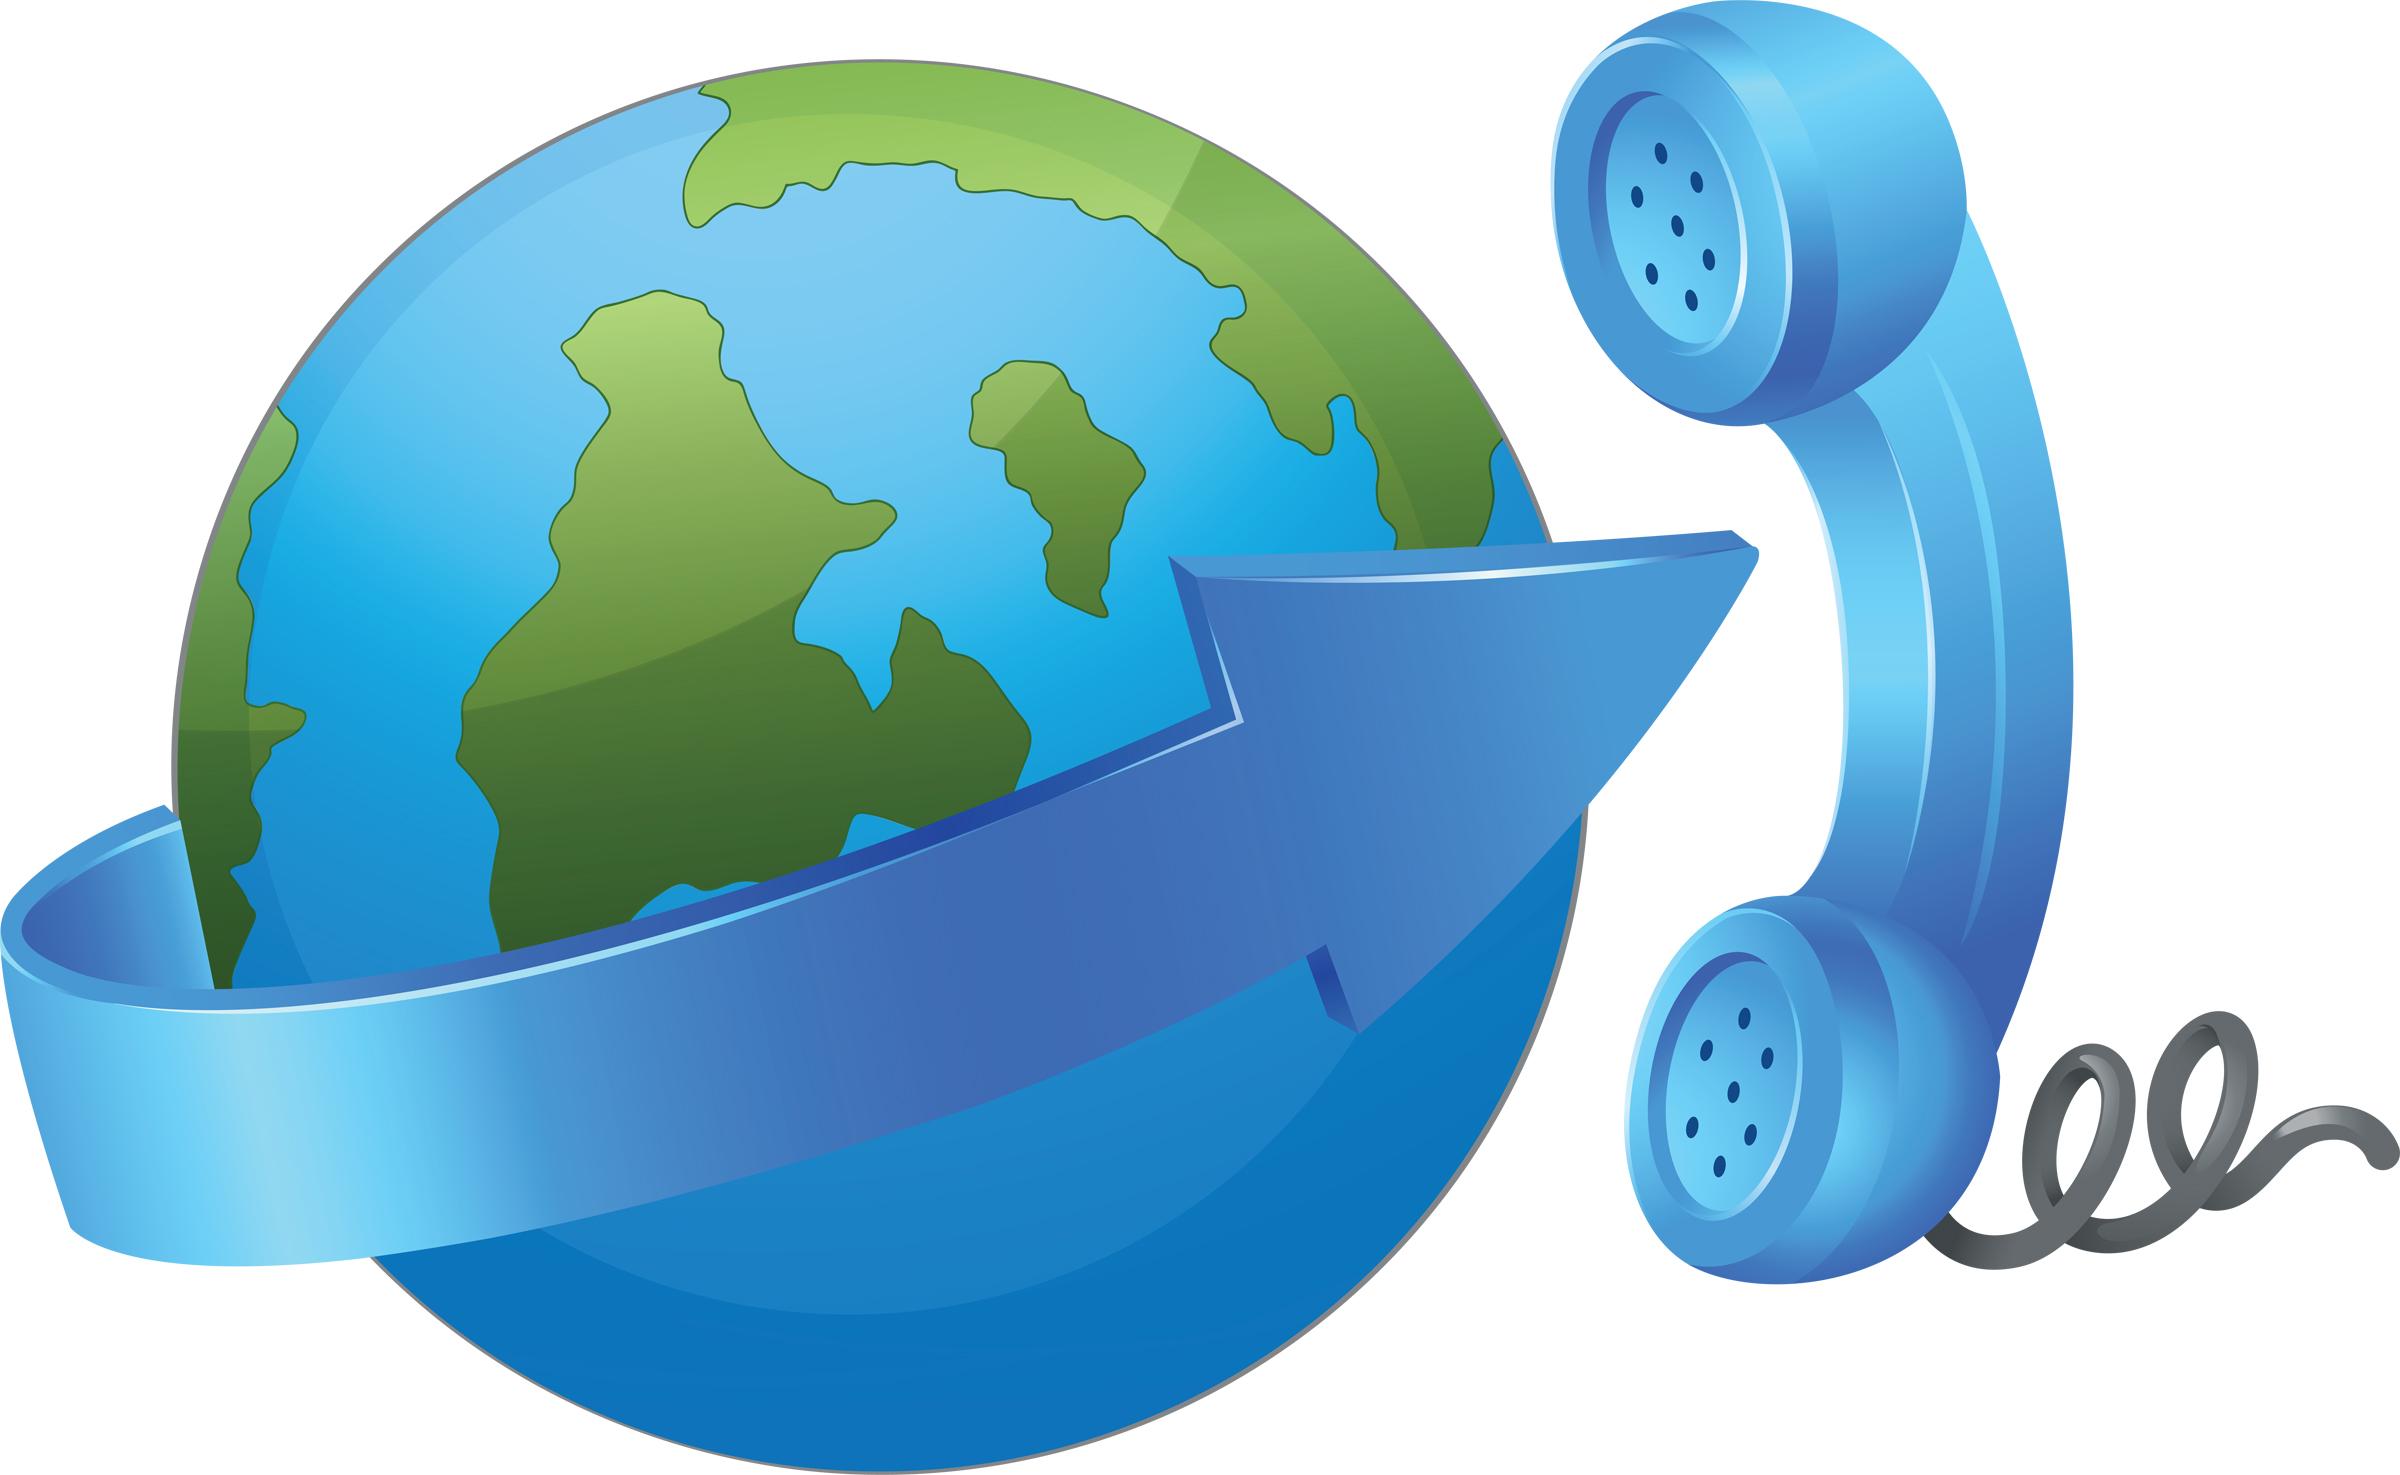 Best phone options for international travel